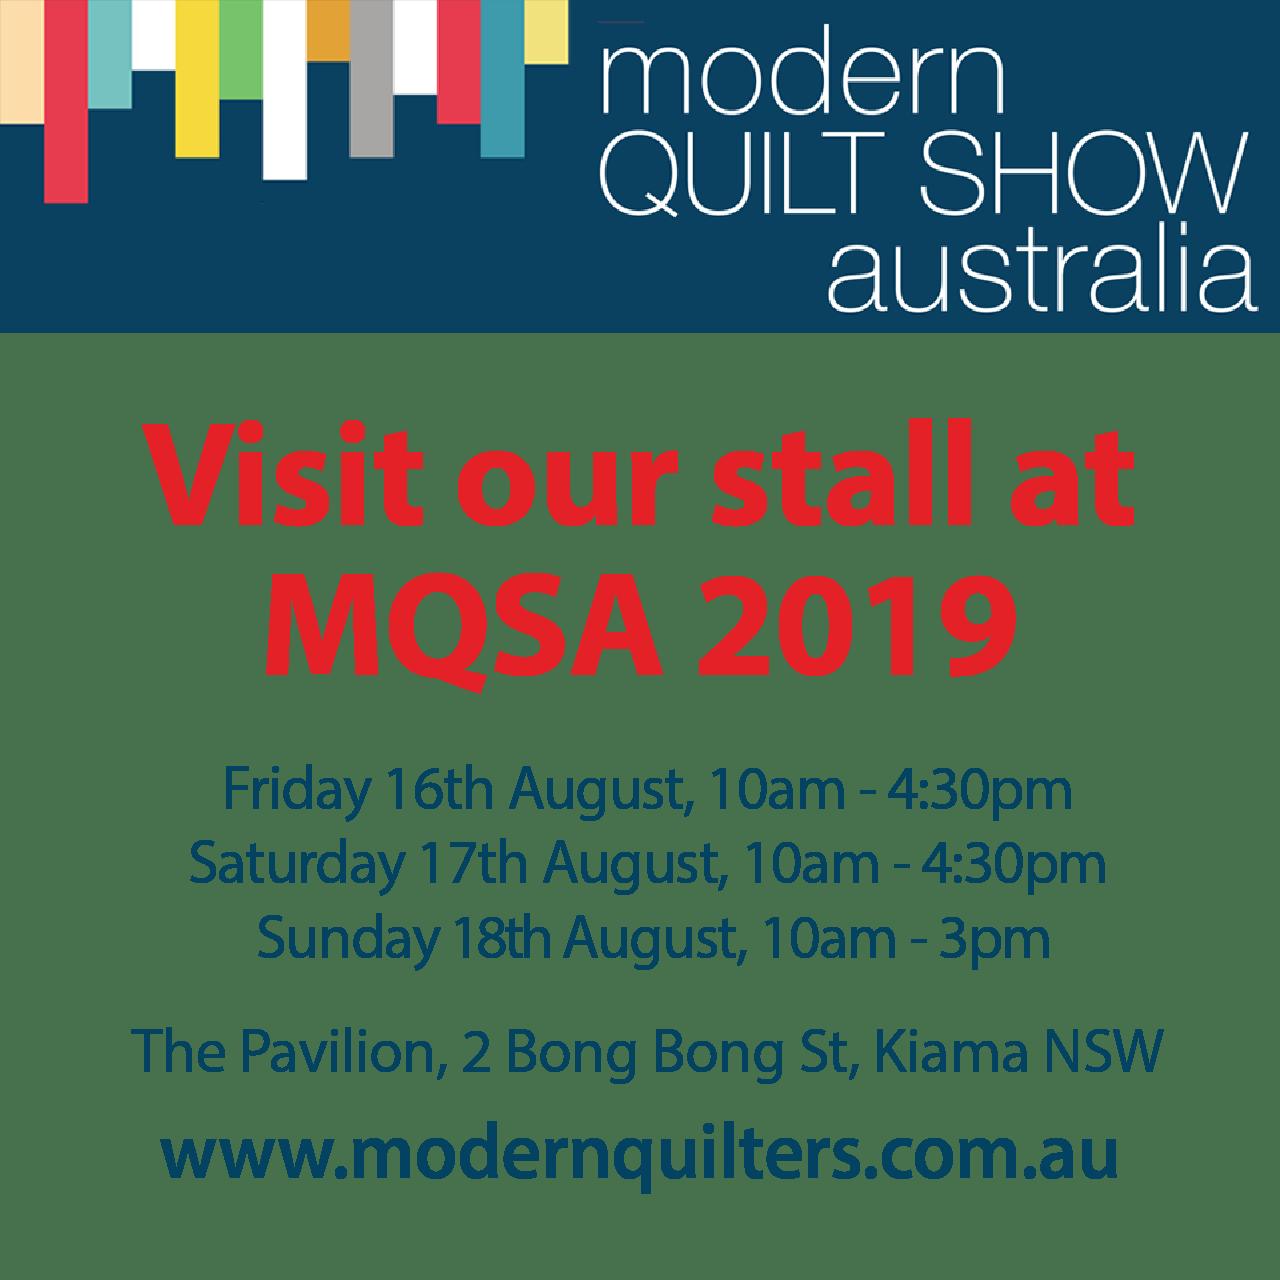 Modern Quilt Show Australia